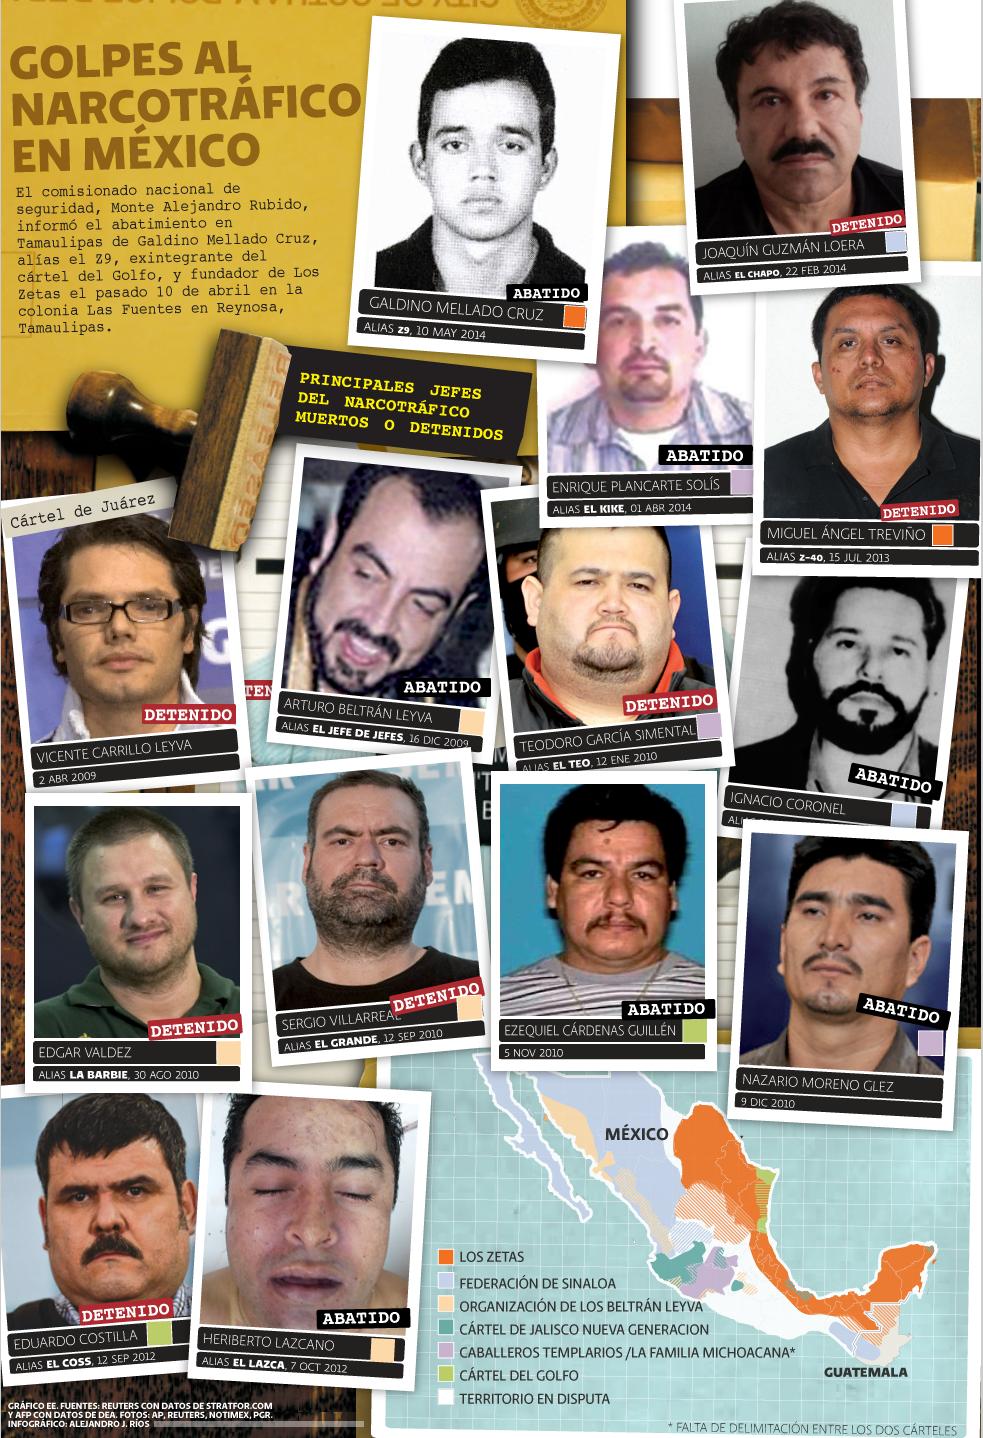 Pin By Lokote Garcia On El Chapo Drug Cartel Mexico Drugs